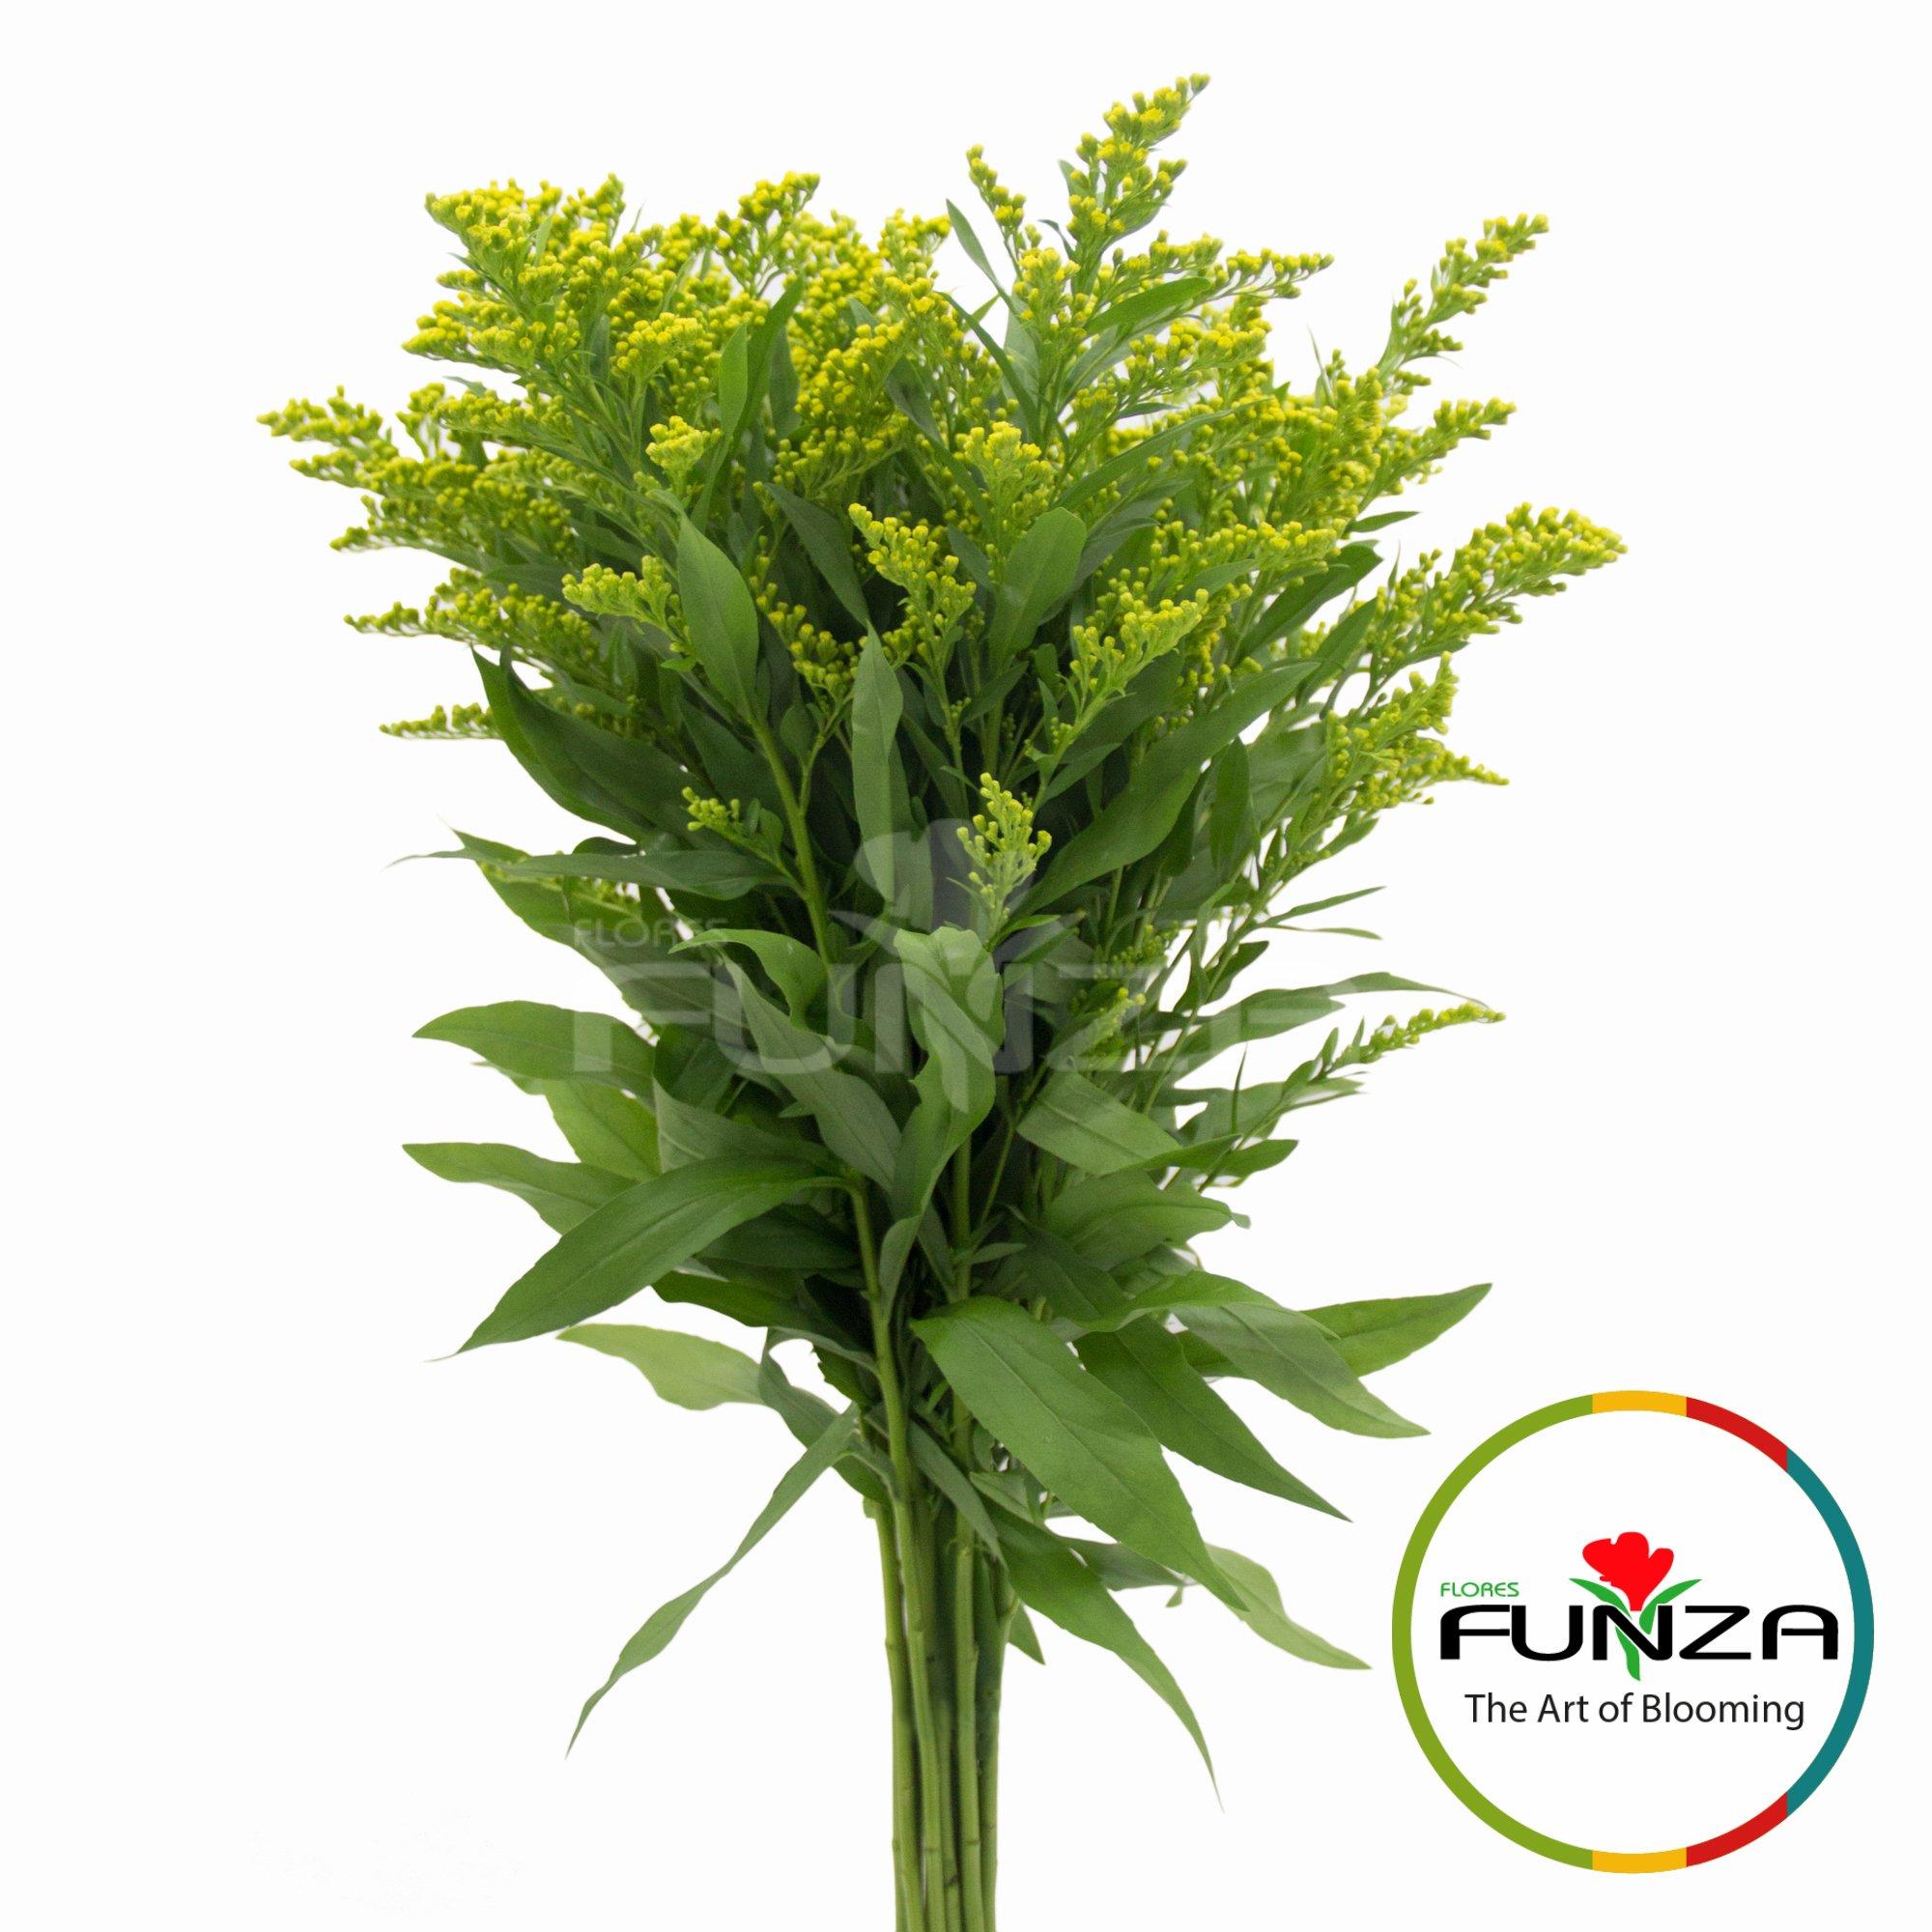 Solidago Golden Glory (1) - Flores Funza